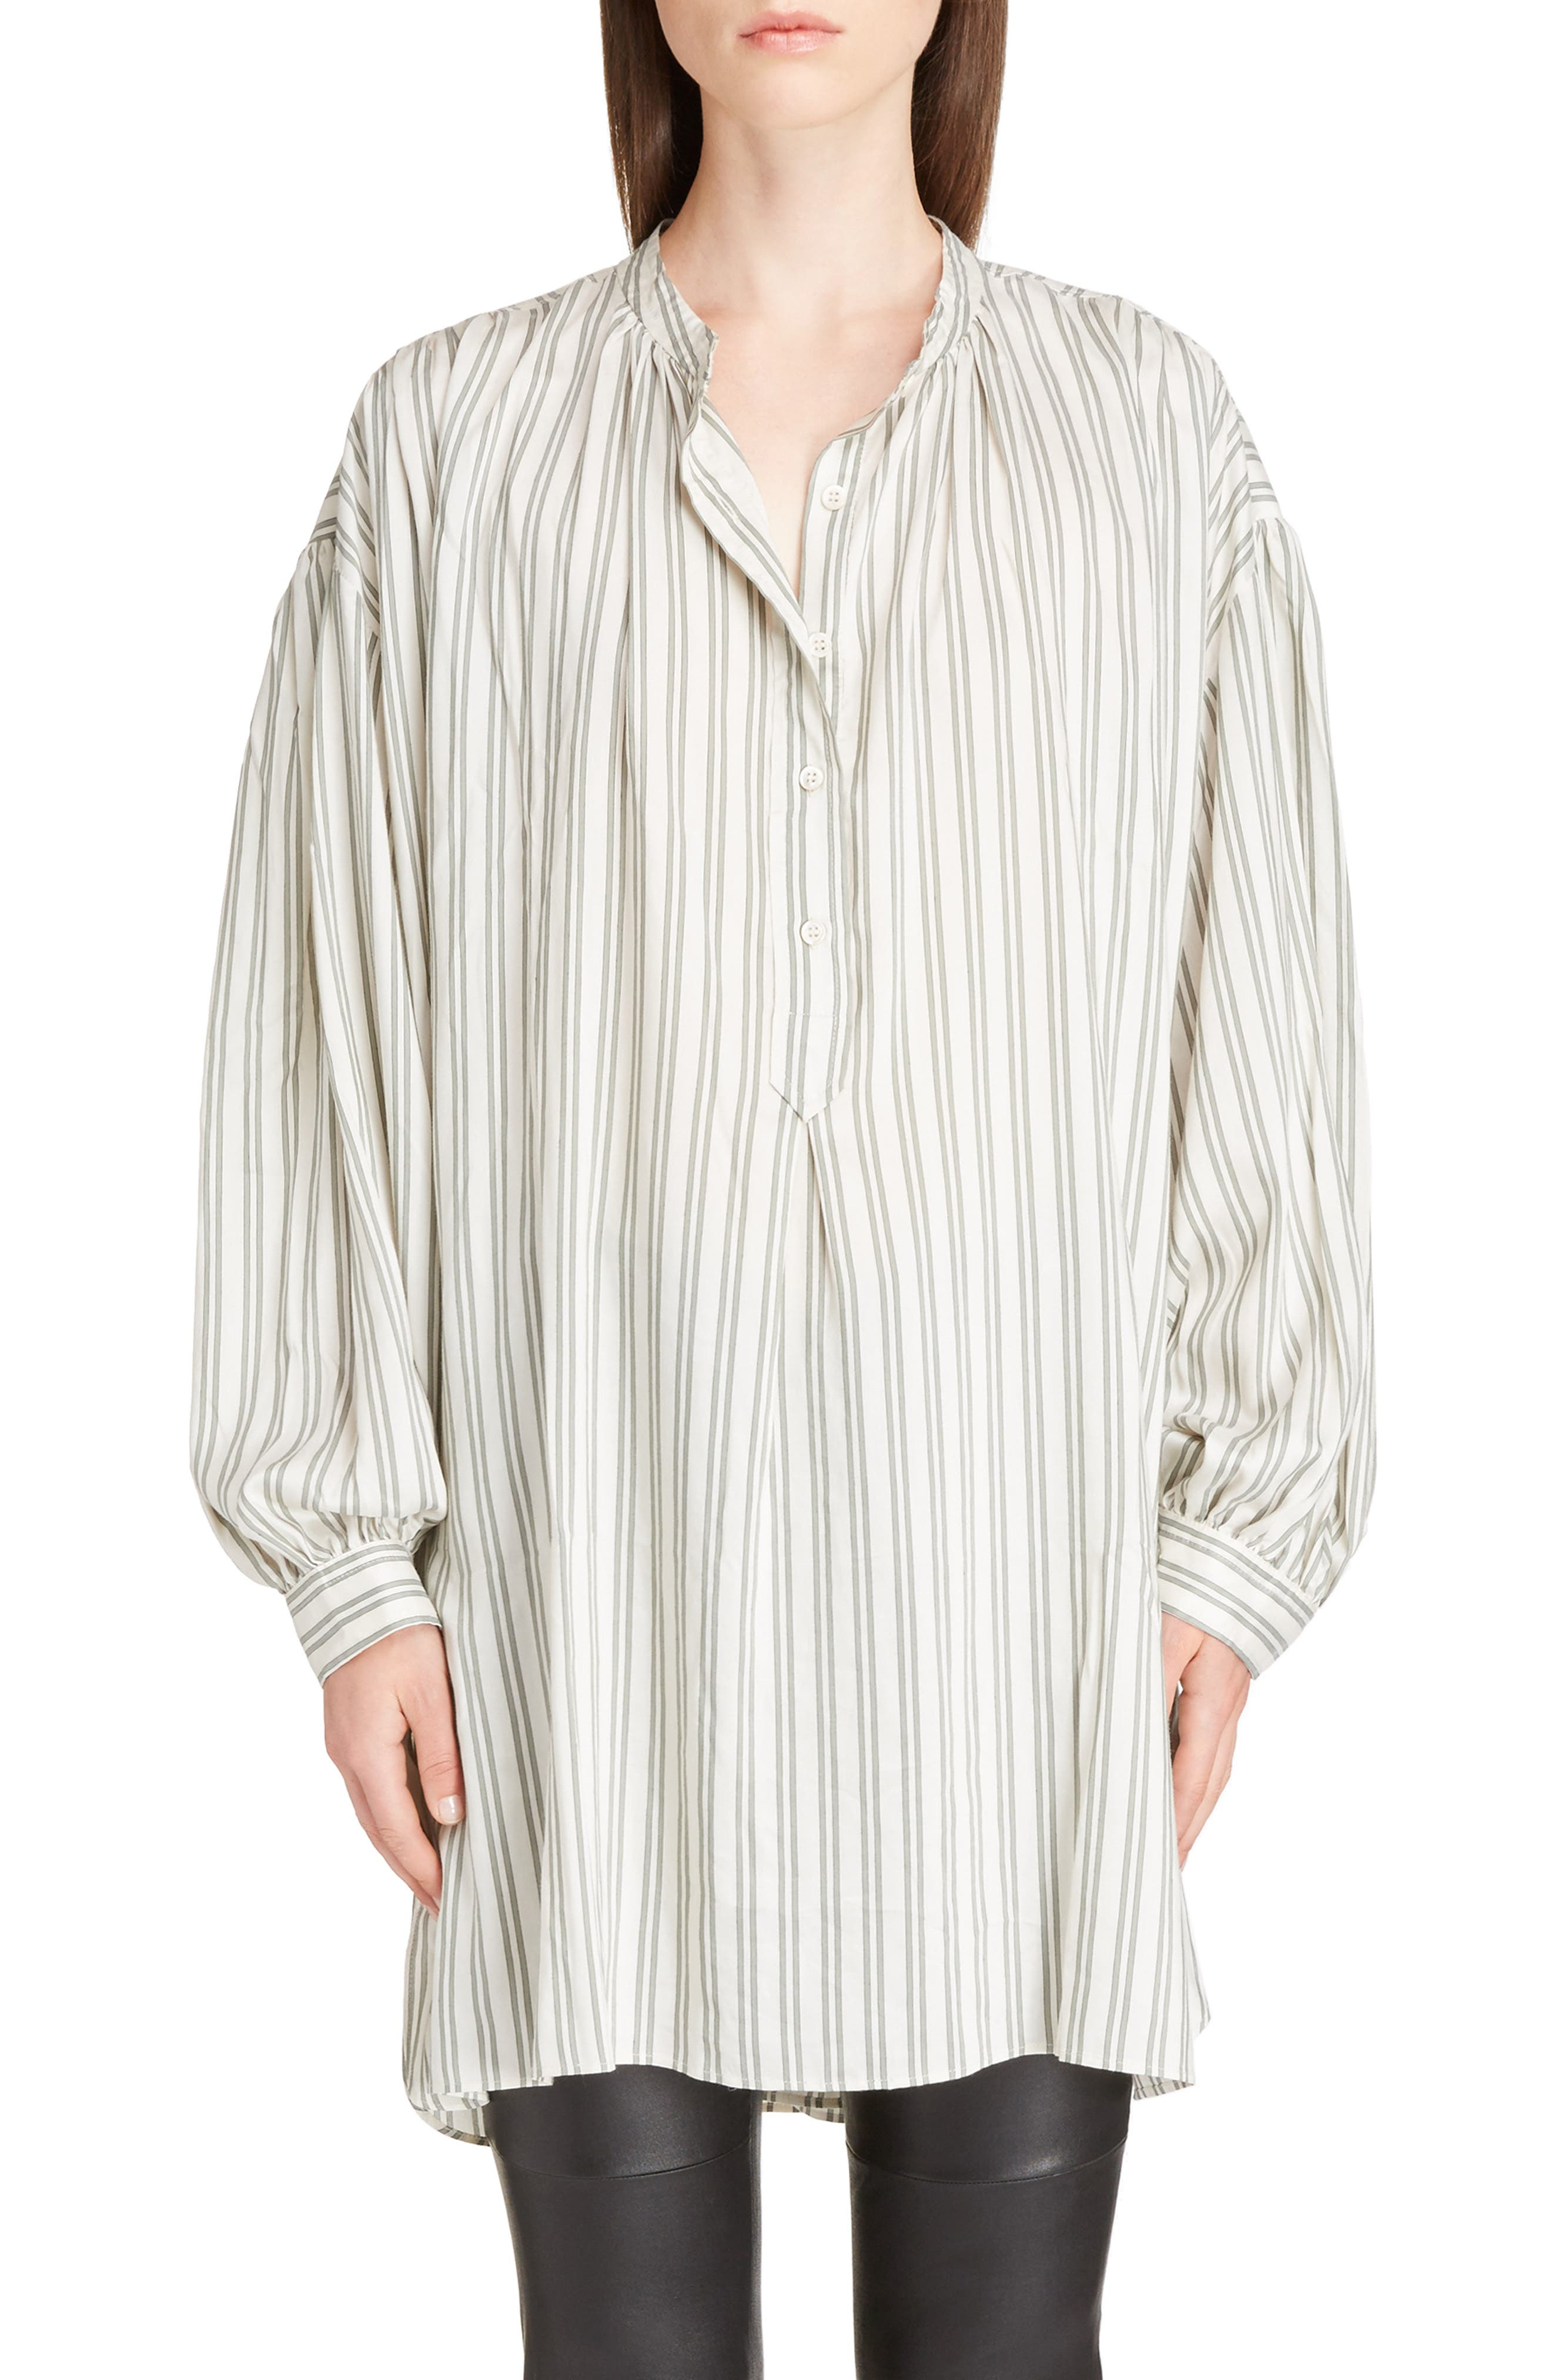 Idoa Stripe Tunic,                             Main thumbnail 1, color,                             100